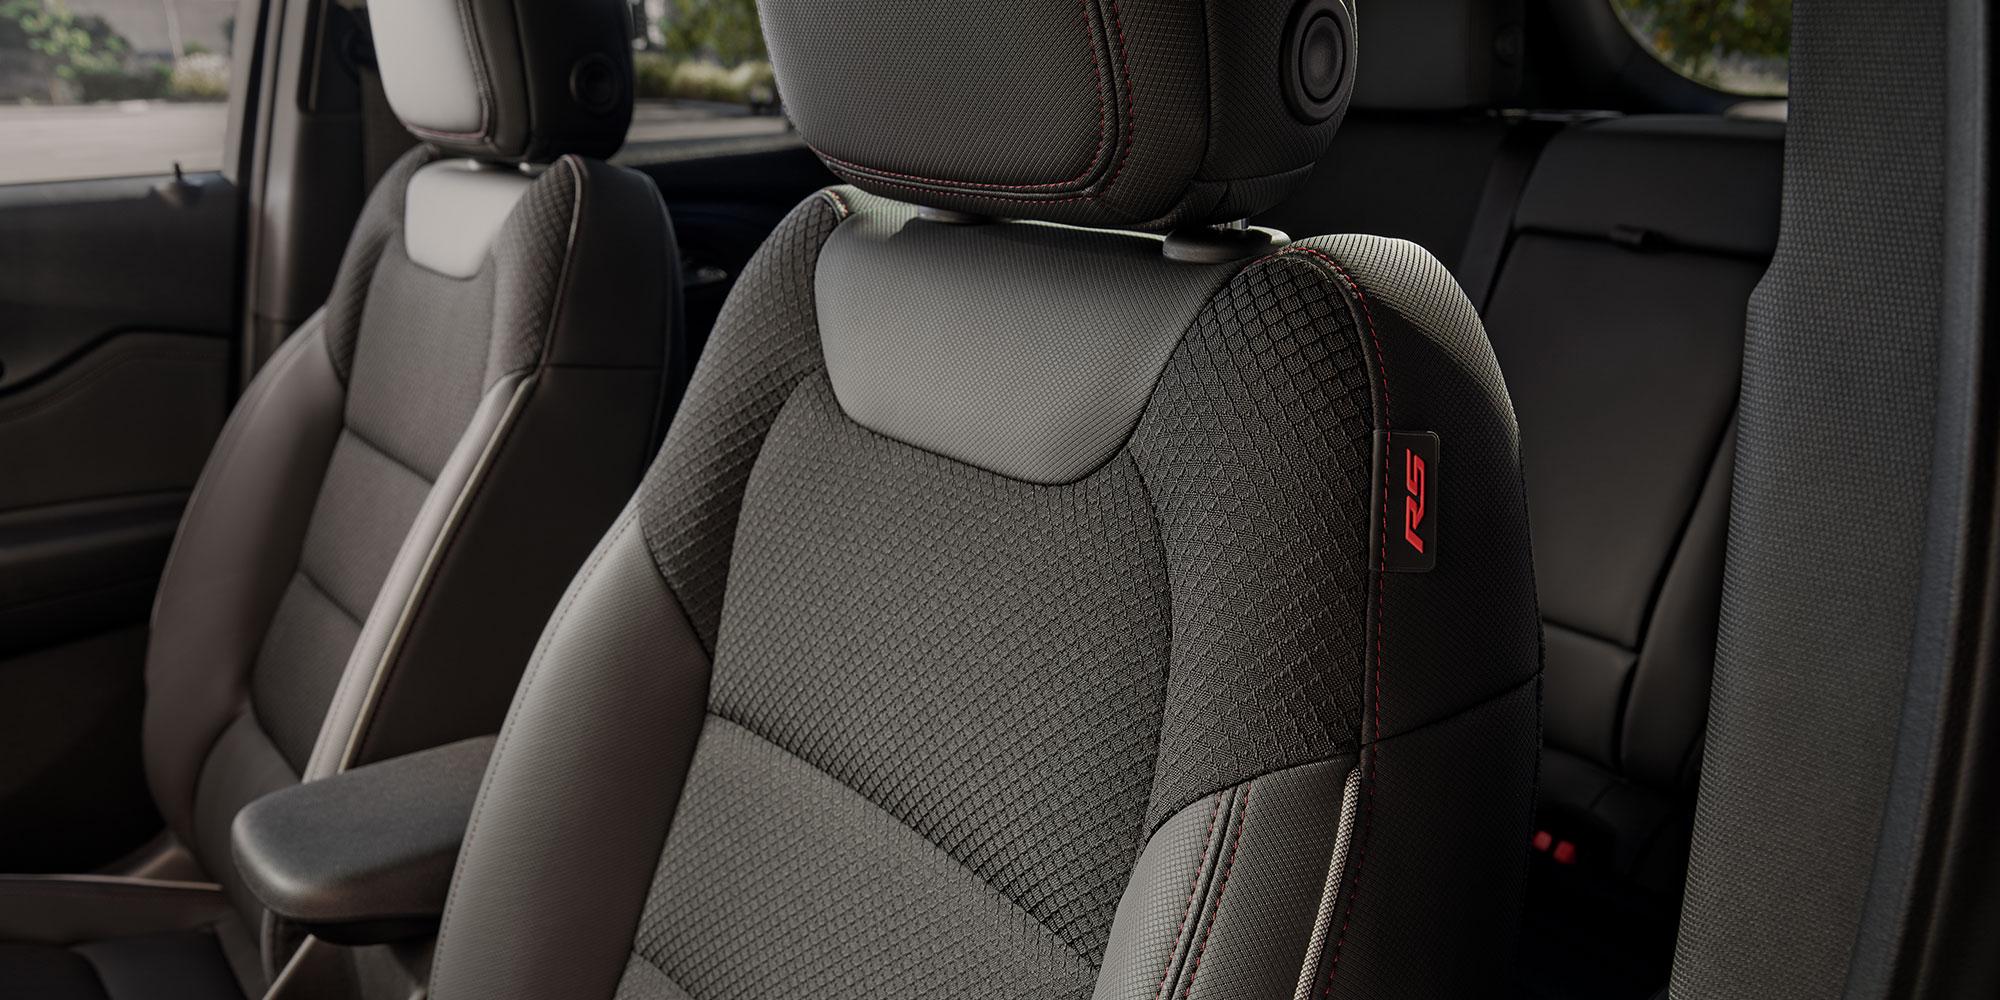 Leatherette Seats in the 2021 Chevrolet Trailblazer